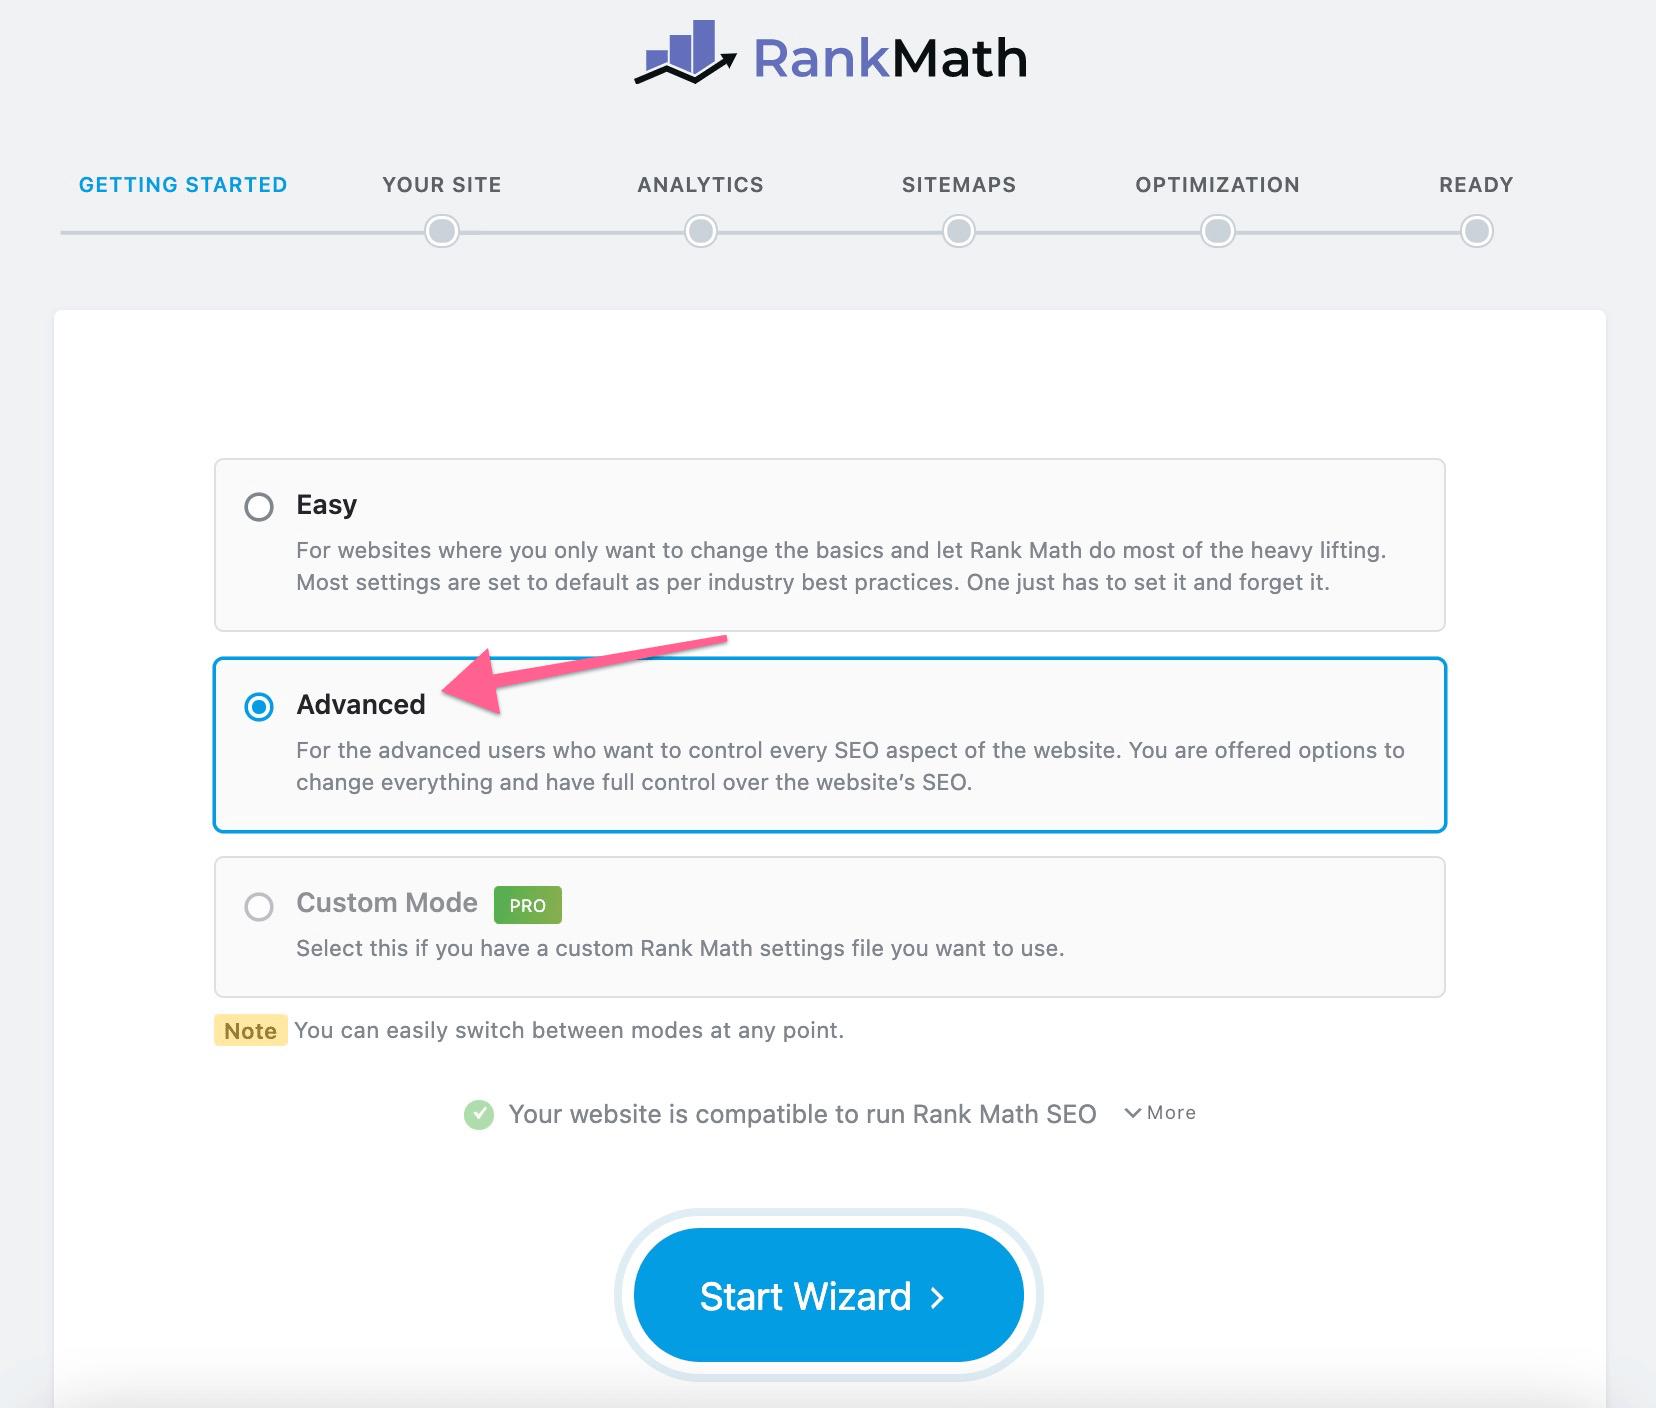 Choose RankMath Advanced Settings